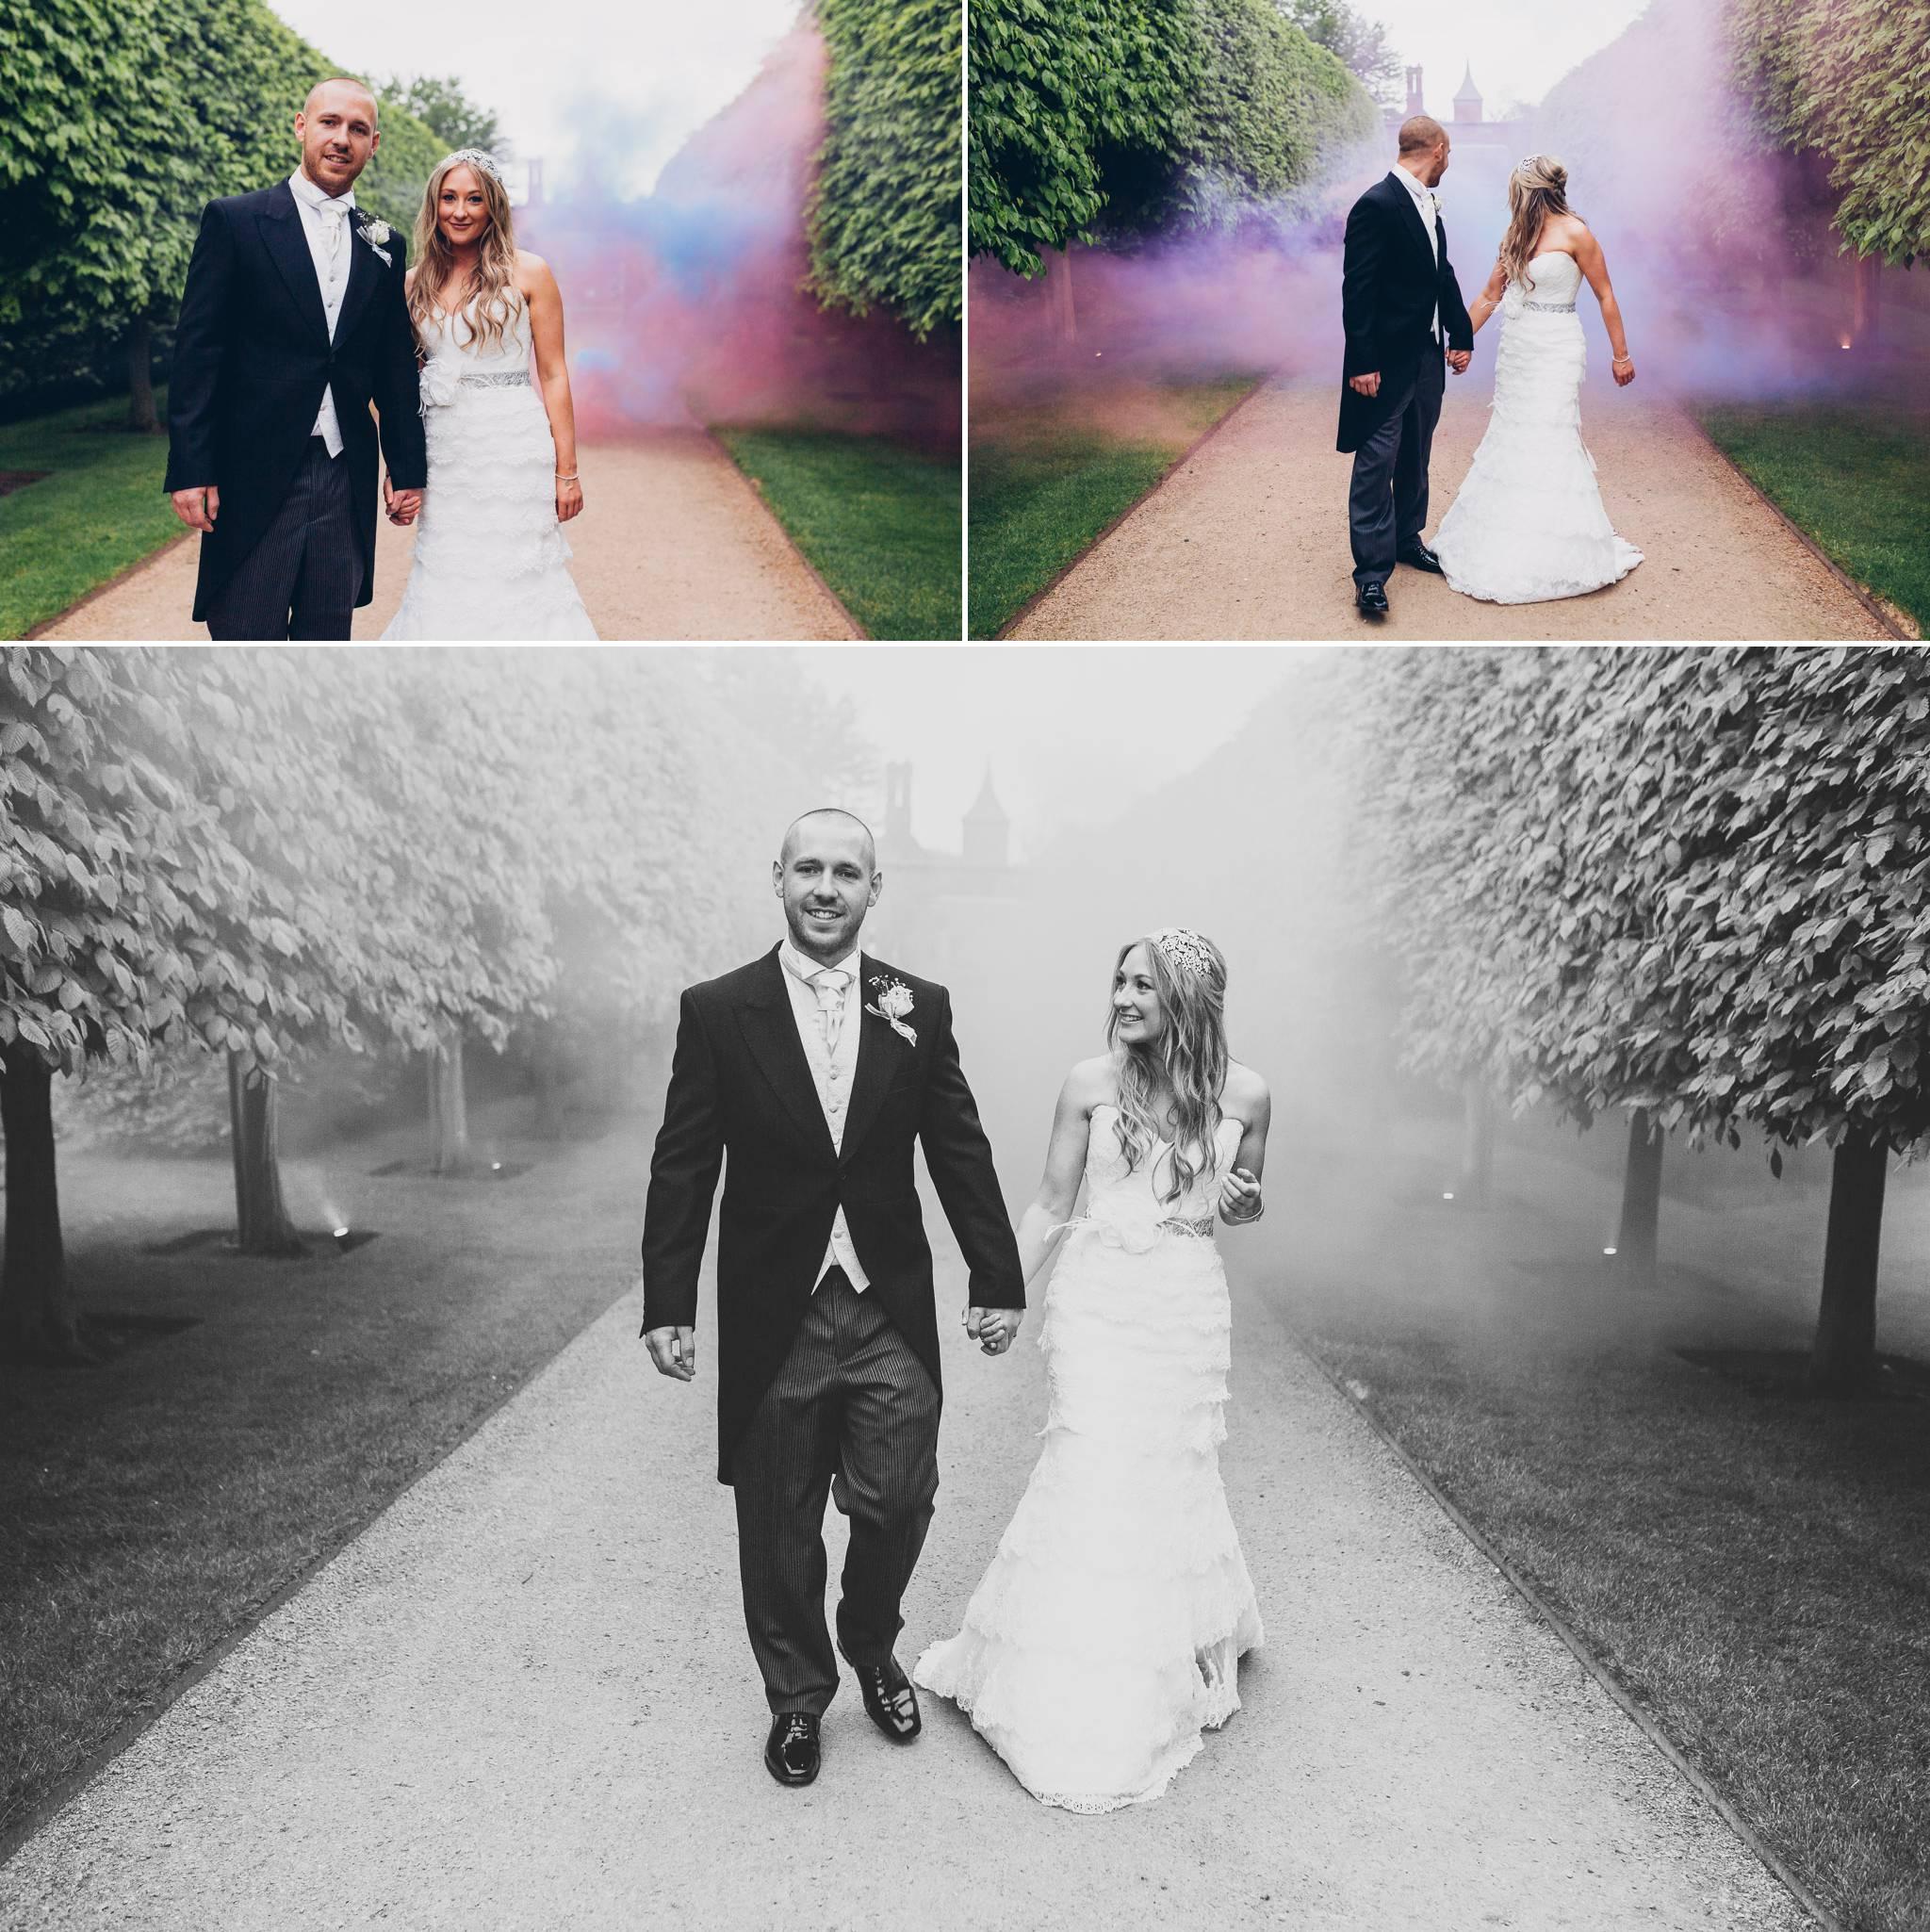 shropshire-wedding-photography 30.jpg